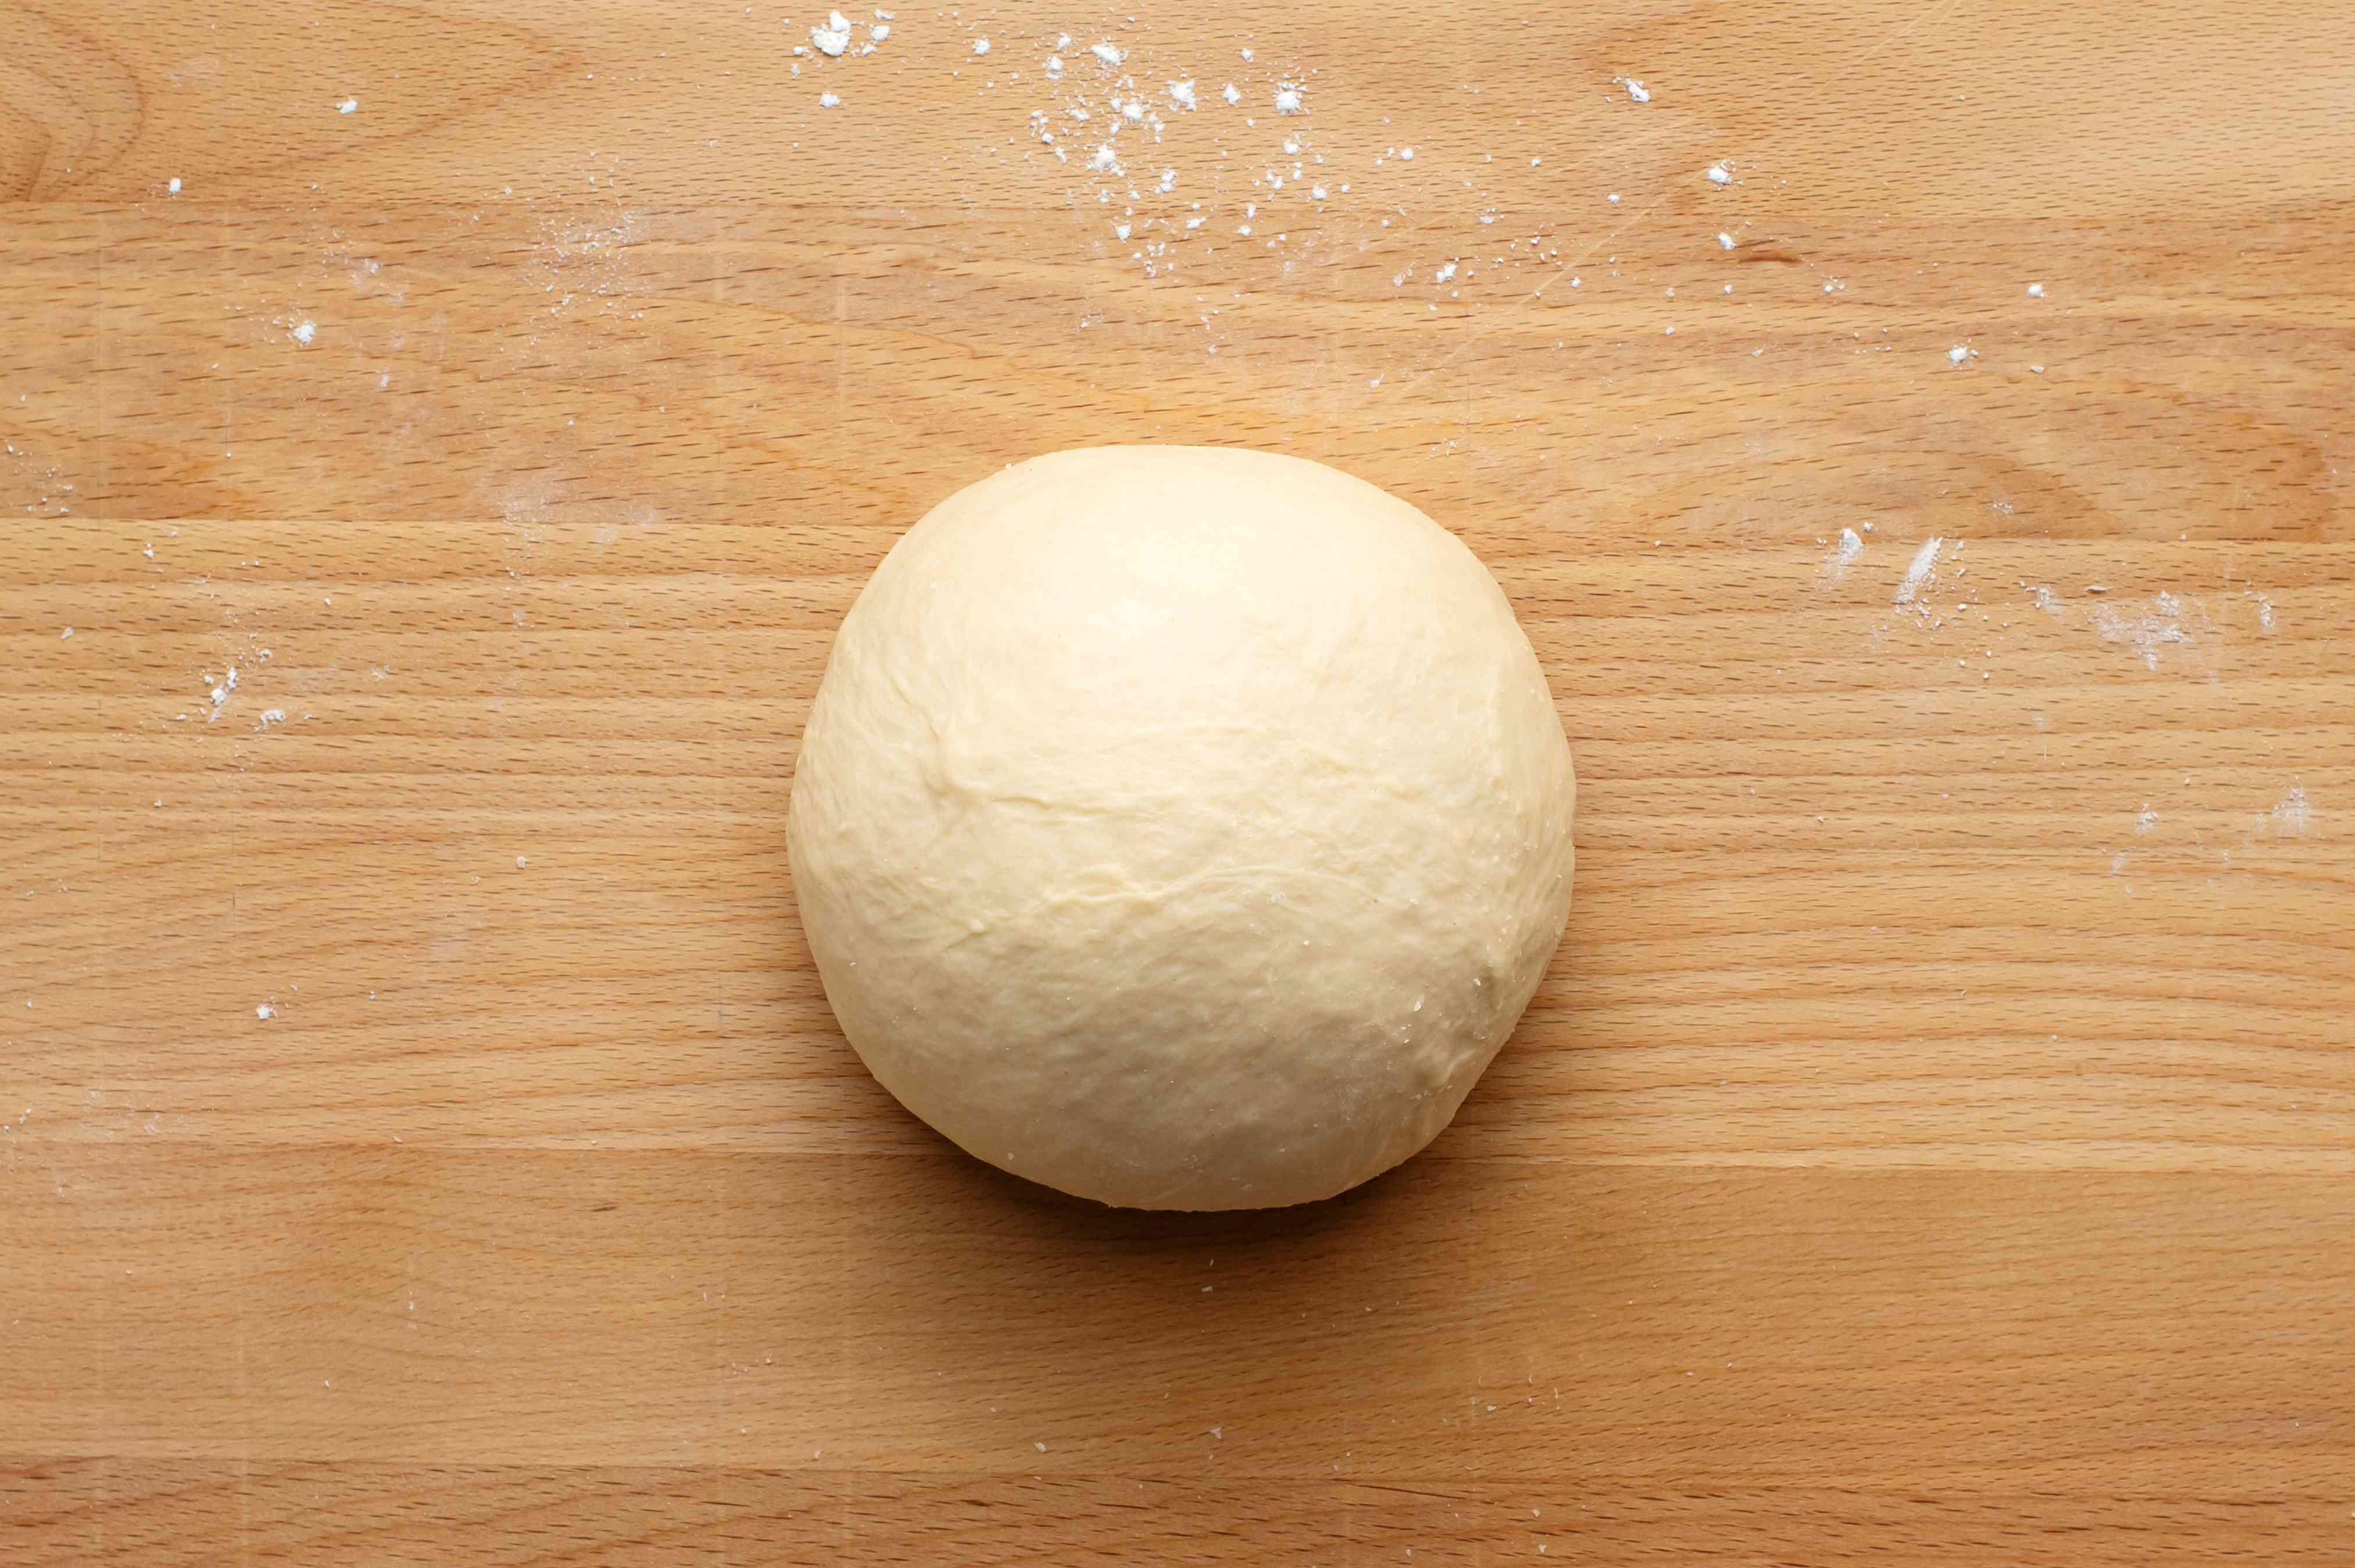 dough ball on a wood board